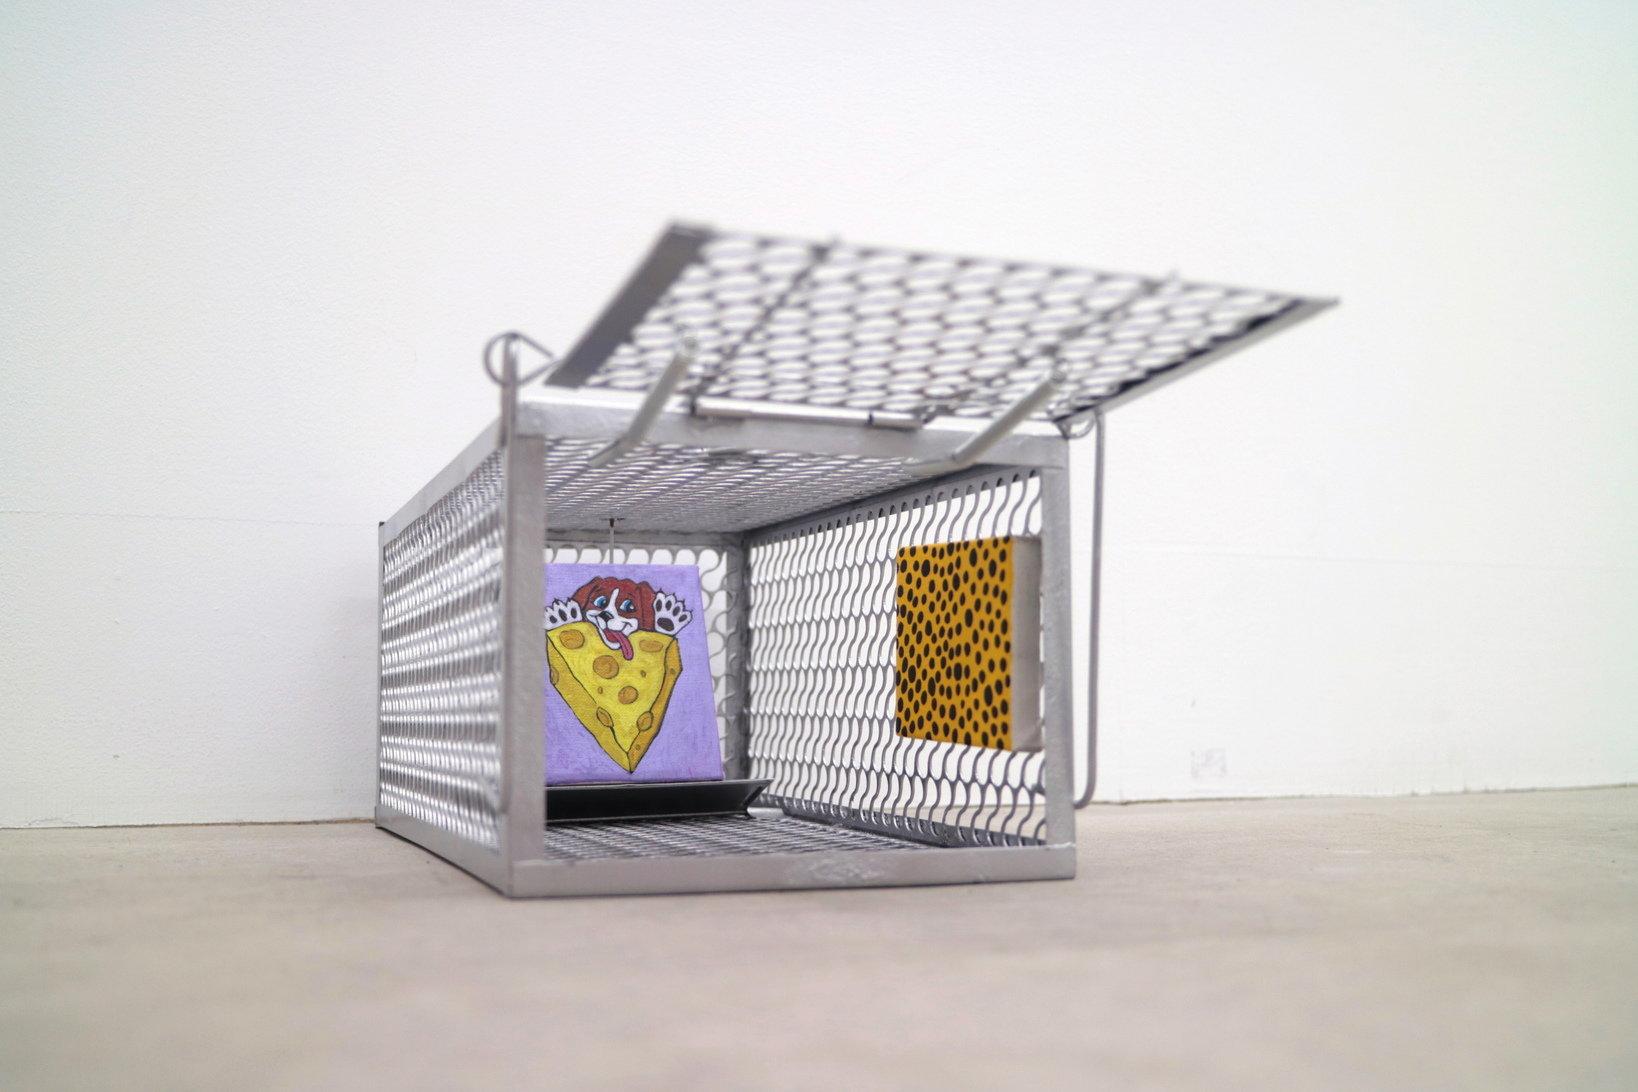 Rat Museum For Rat 2019 / Rat trap, acrylic on canvas, wood panel / 350x115x115 mm , 83x71 mm , 55x72 mm